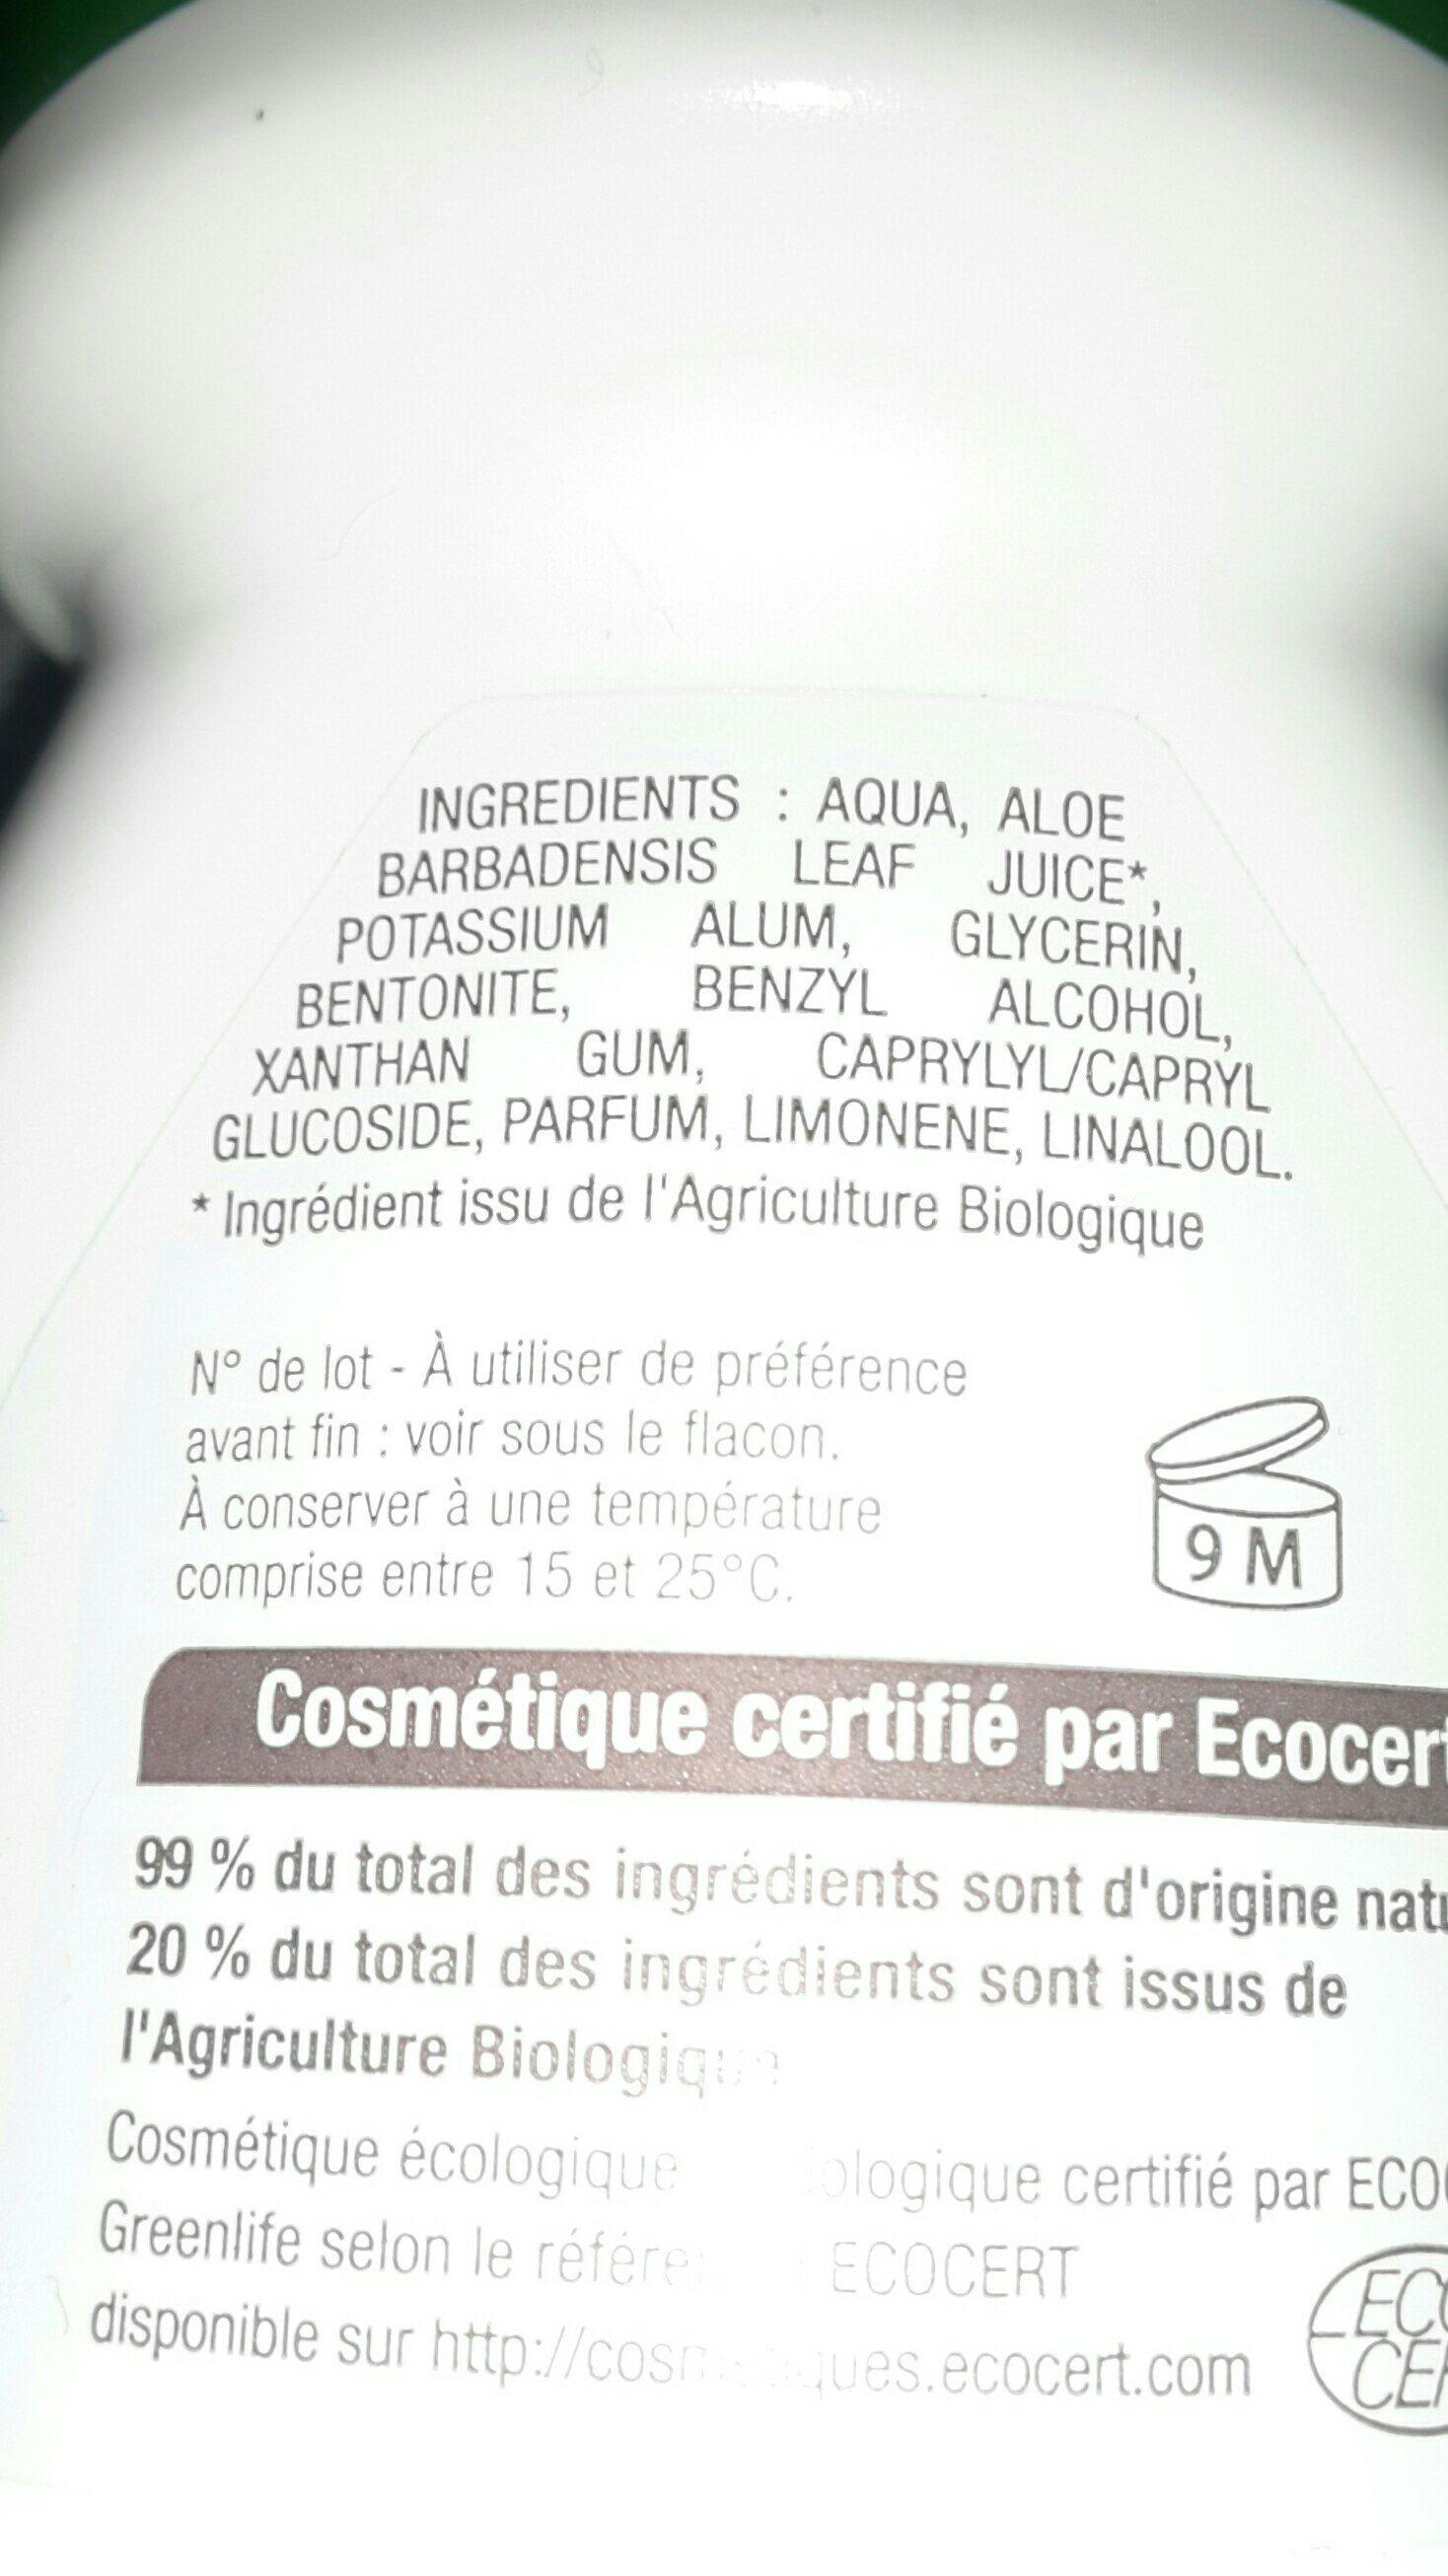 Biophy Fleur De Lin Feminine Deodorant Roll-on - Ingredients - fr